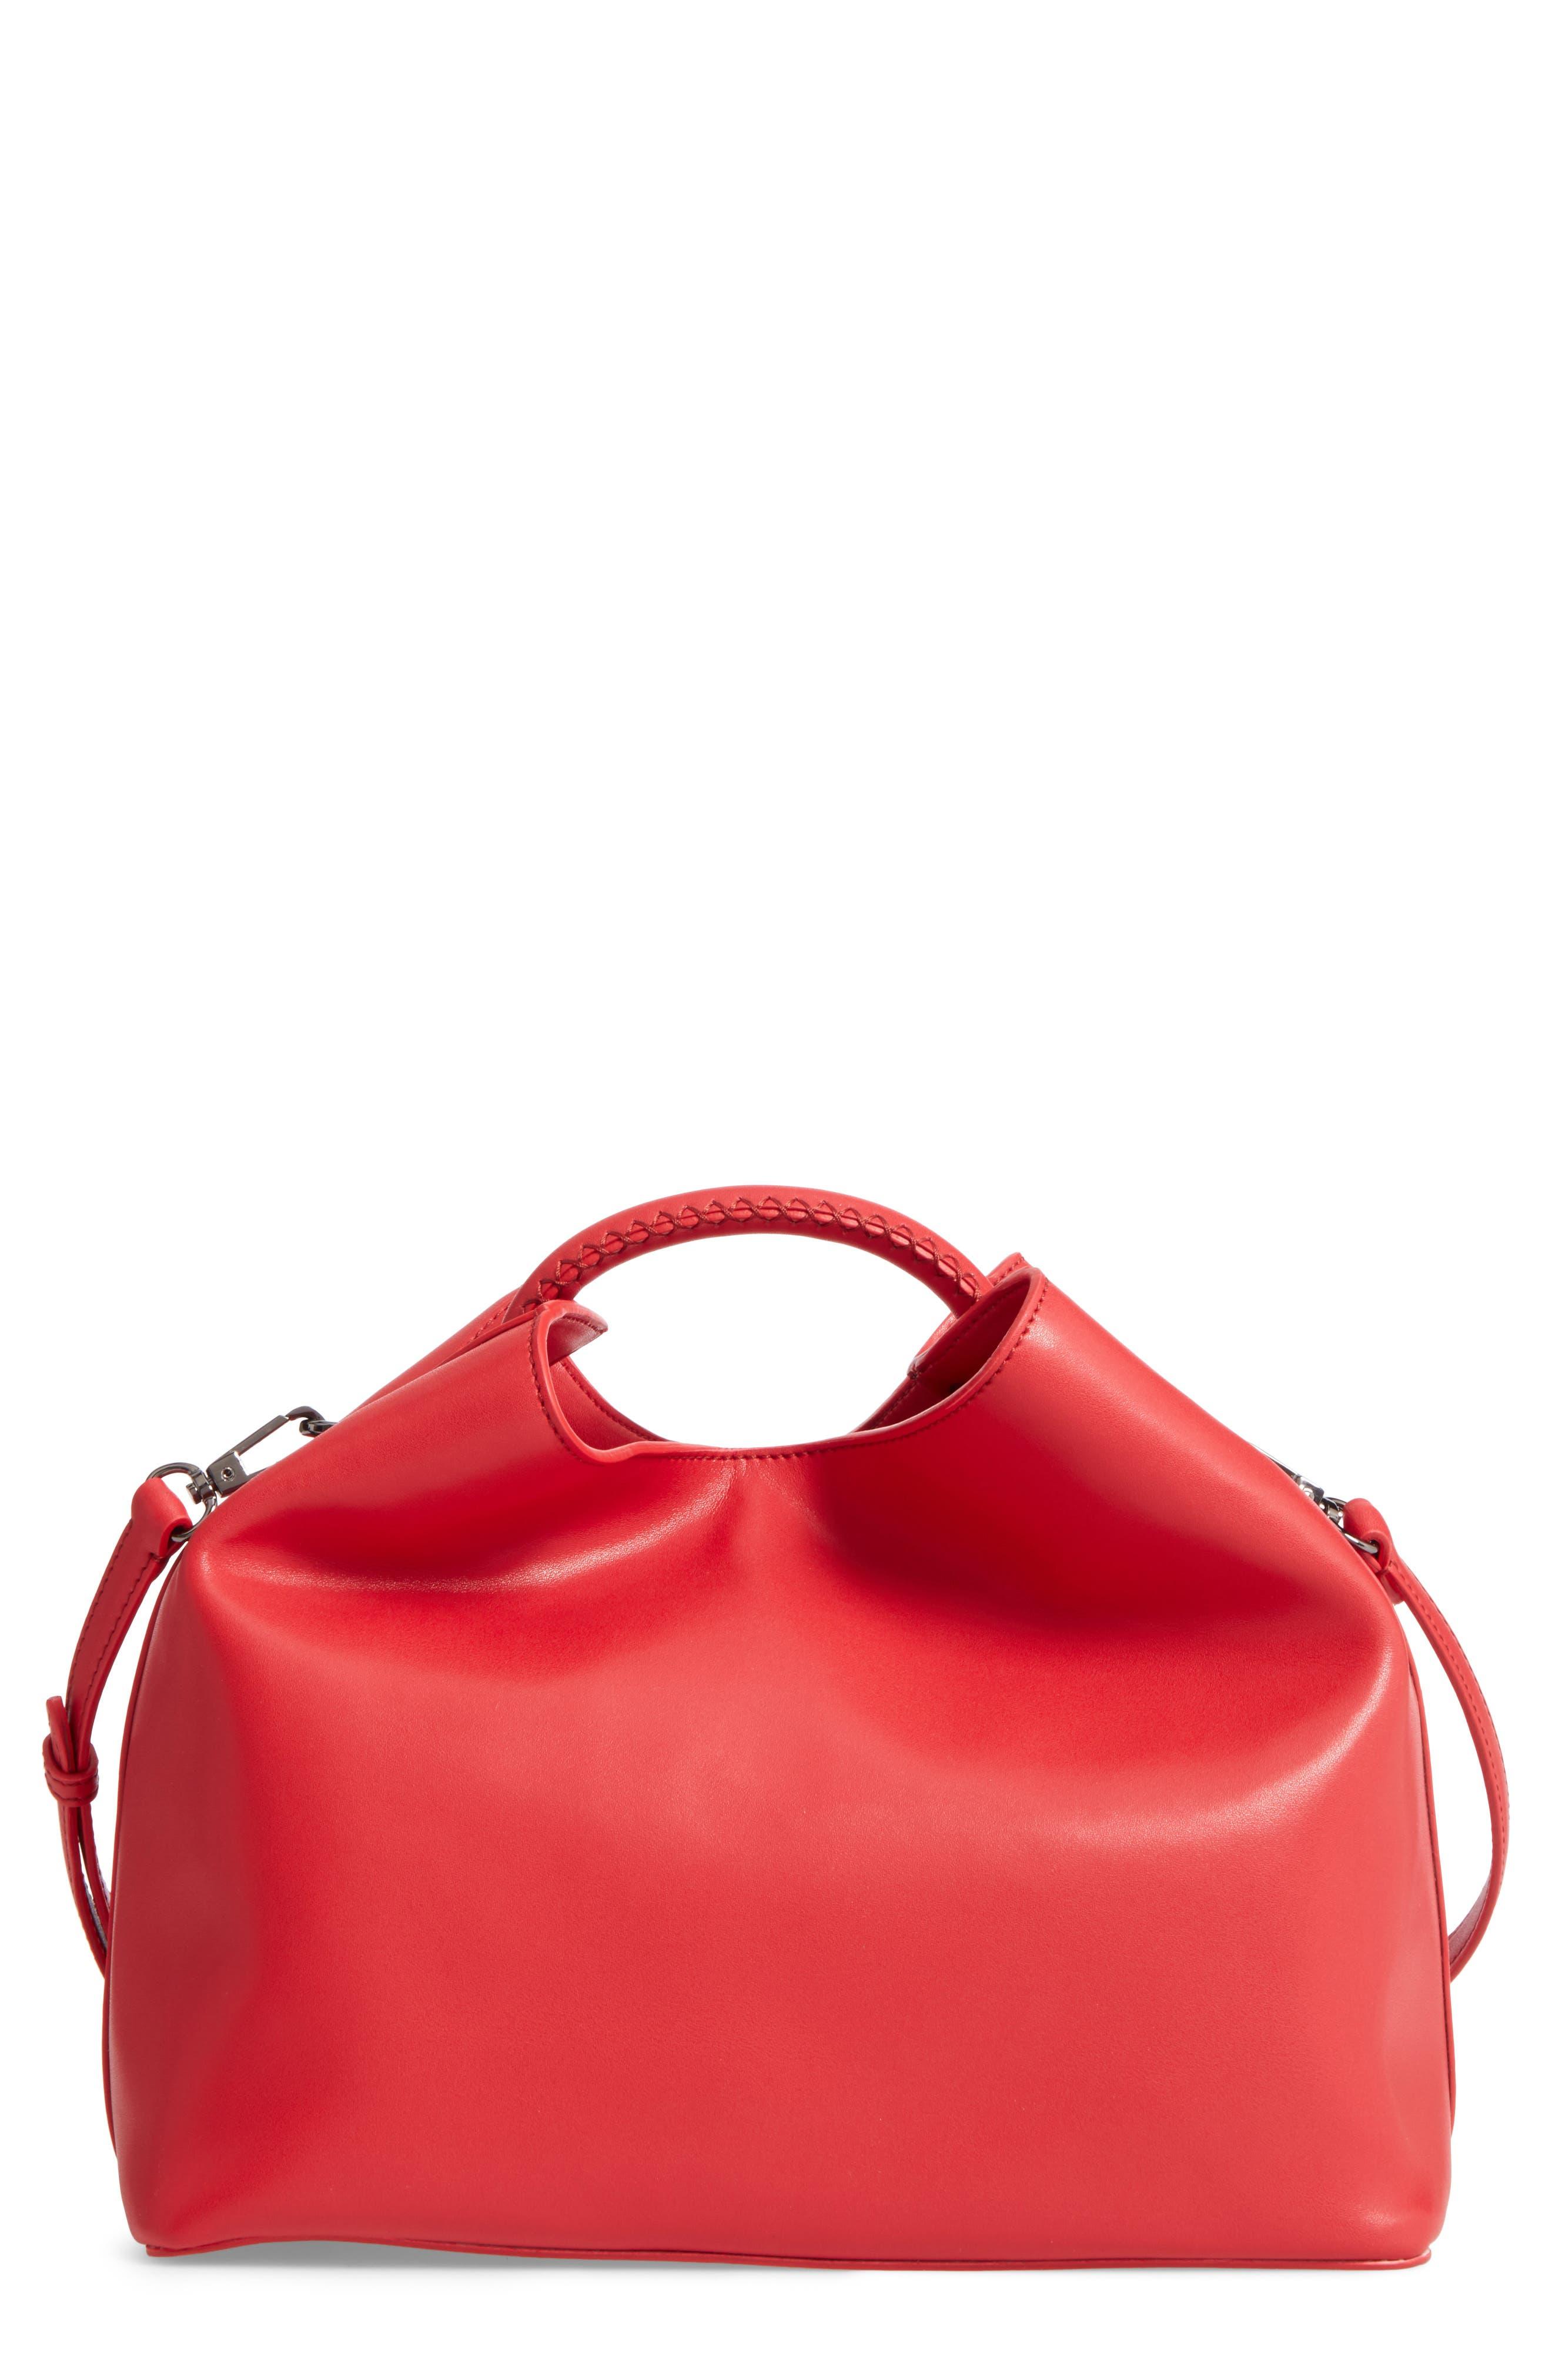 Alternate Image 1 Selected - Elleme Raisin Leather Handbag